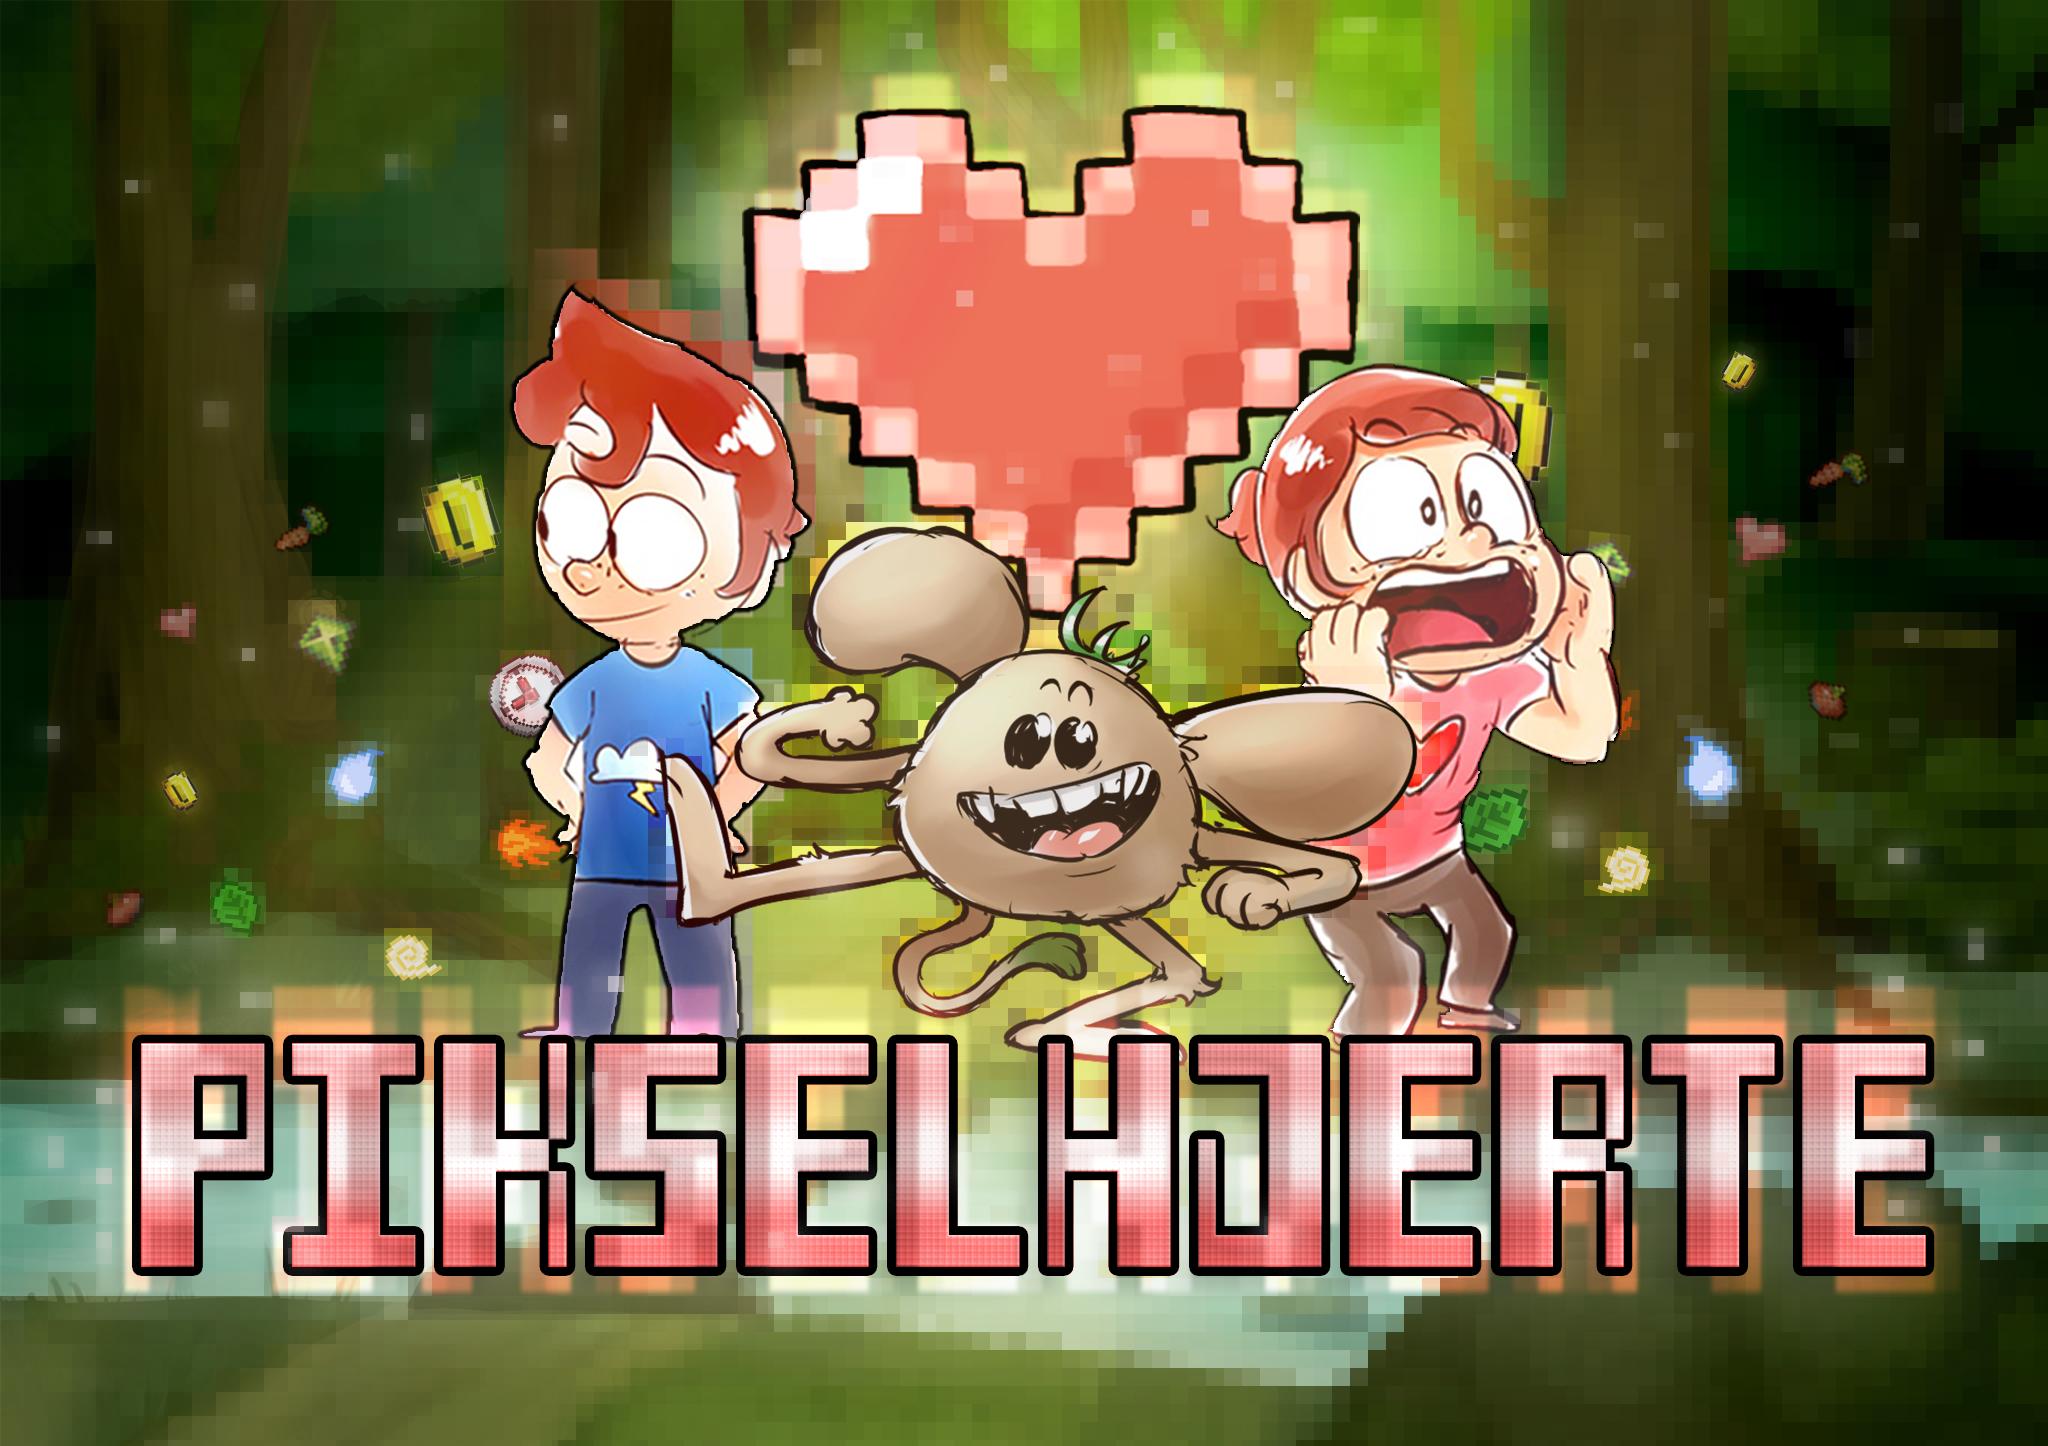 PixelHjerte The Game